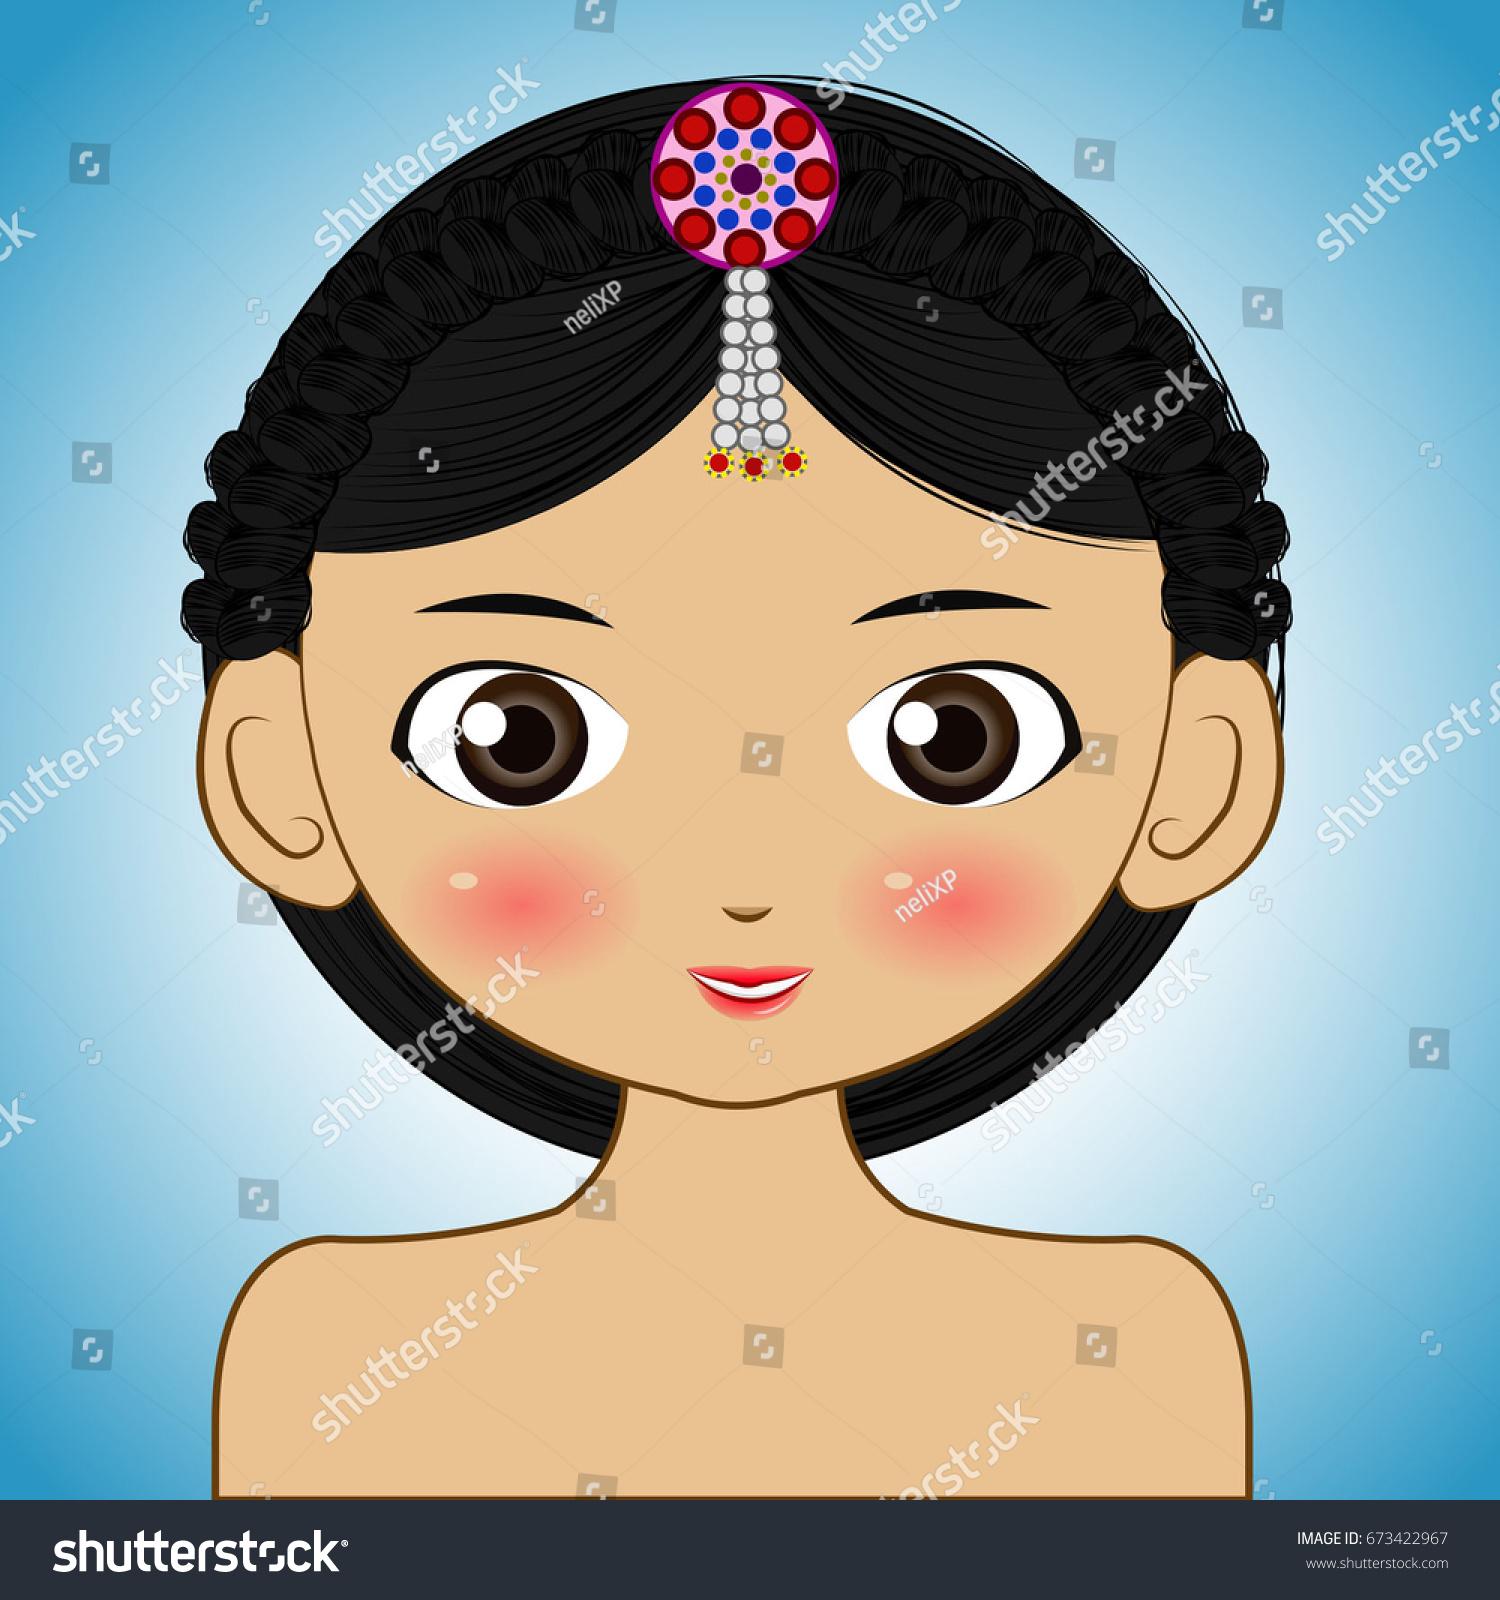 Beautiful Korean Girl Big Eyes Cute Stock Vector Royalty Free 673422967